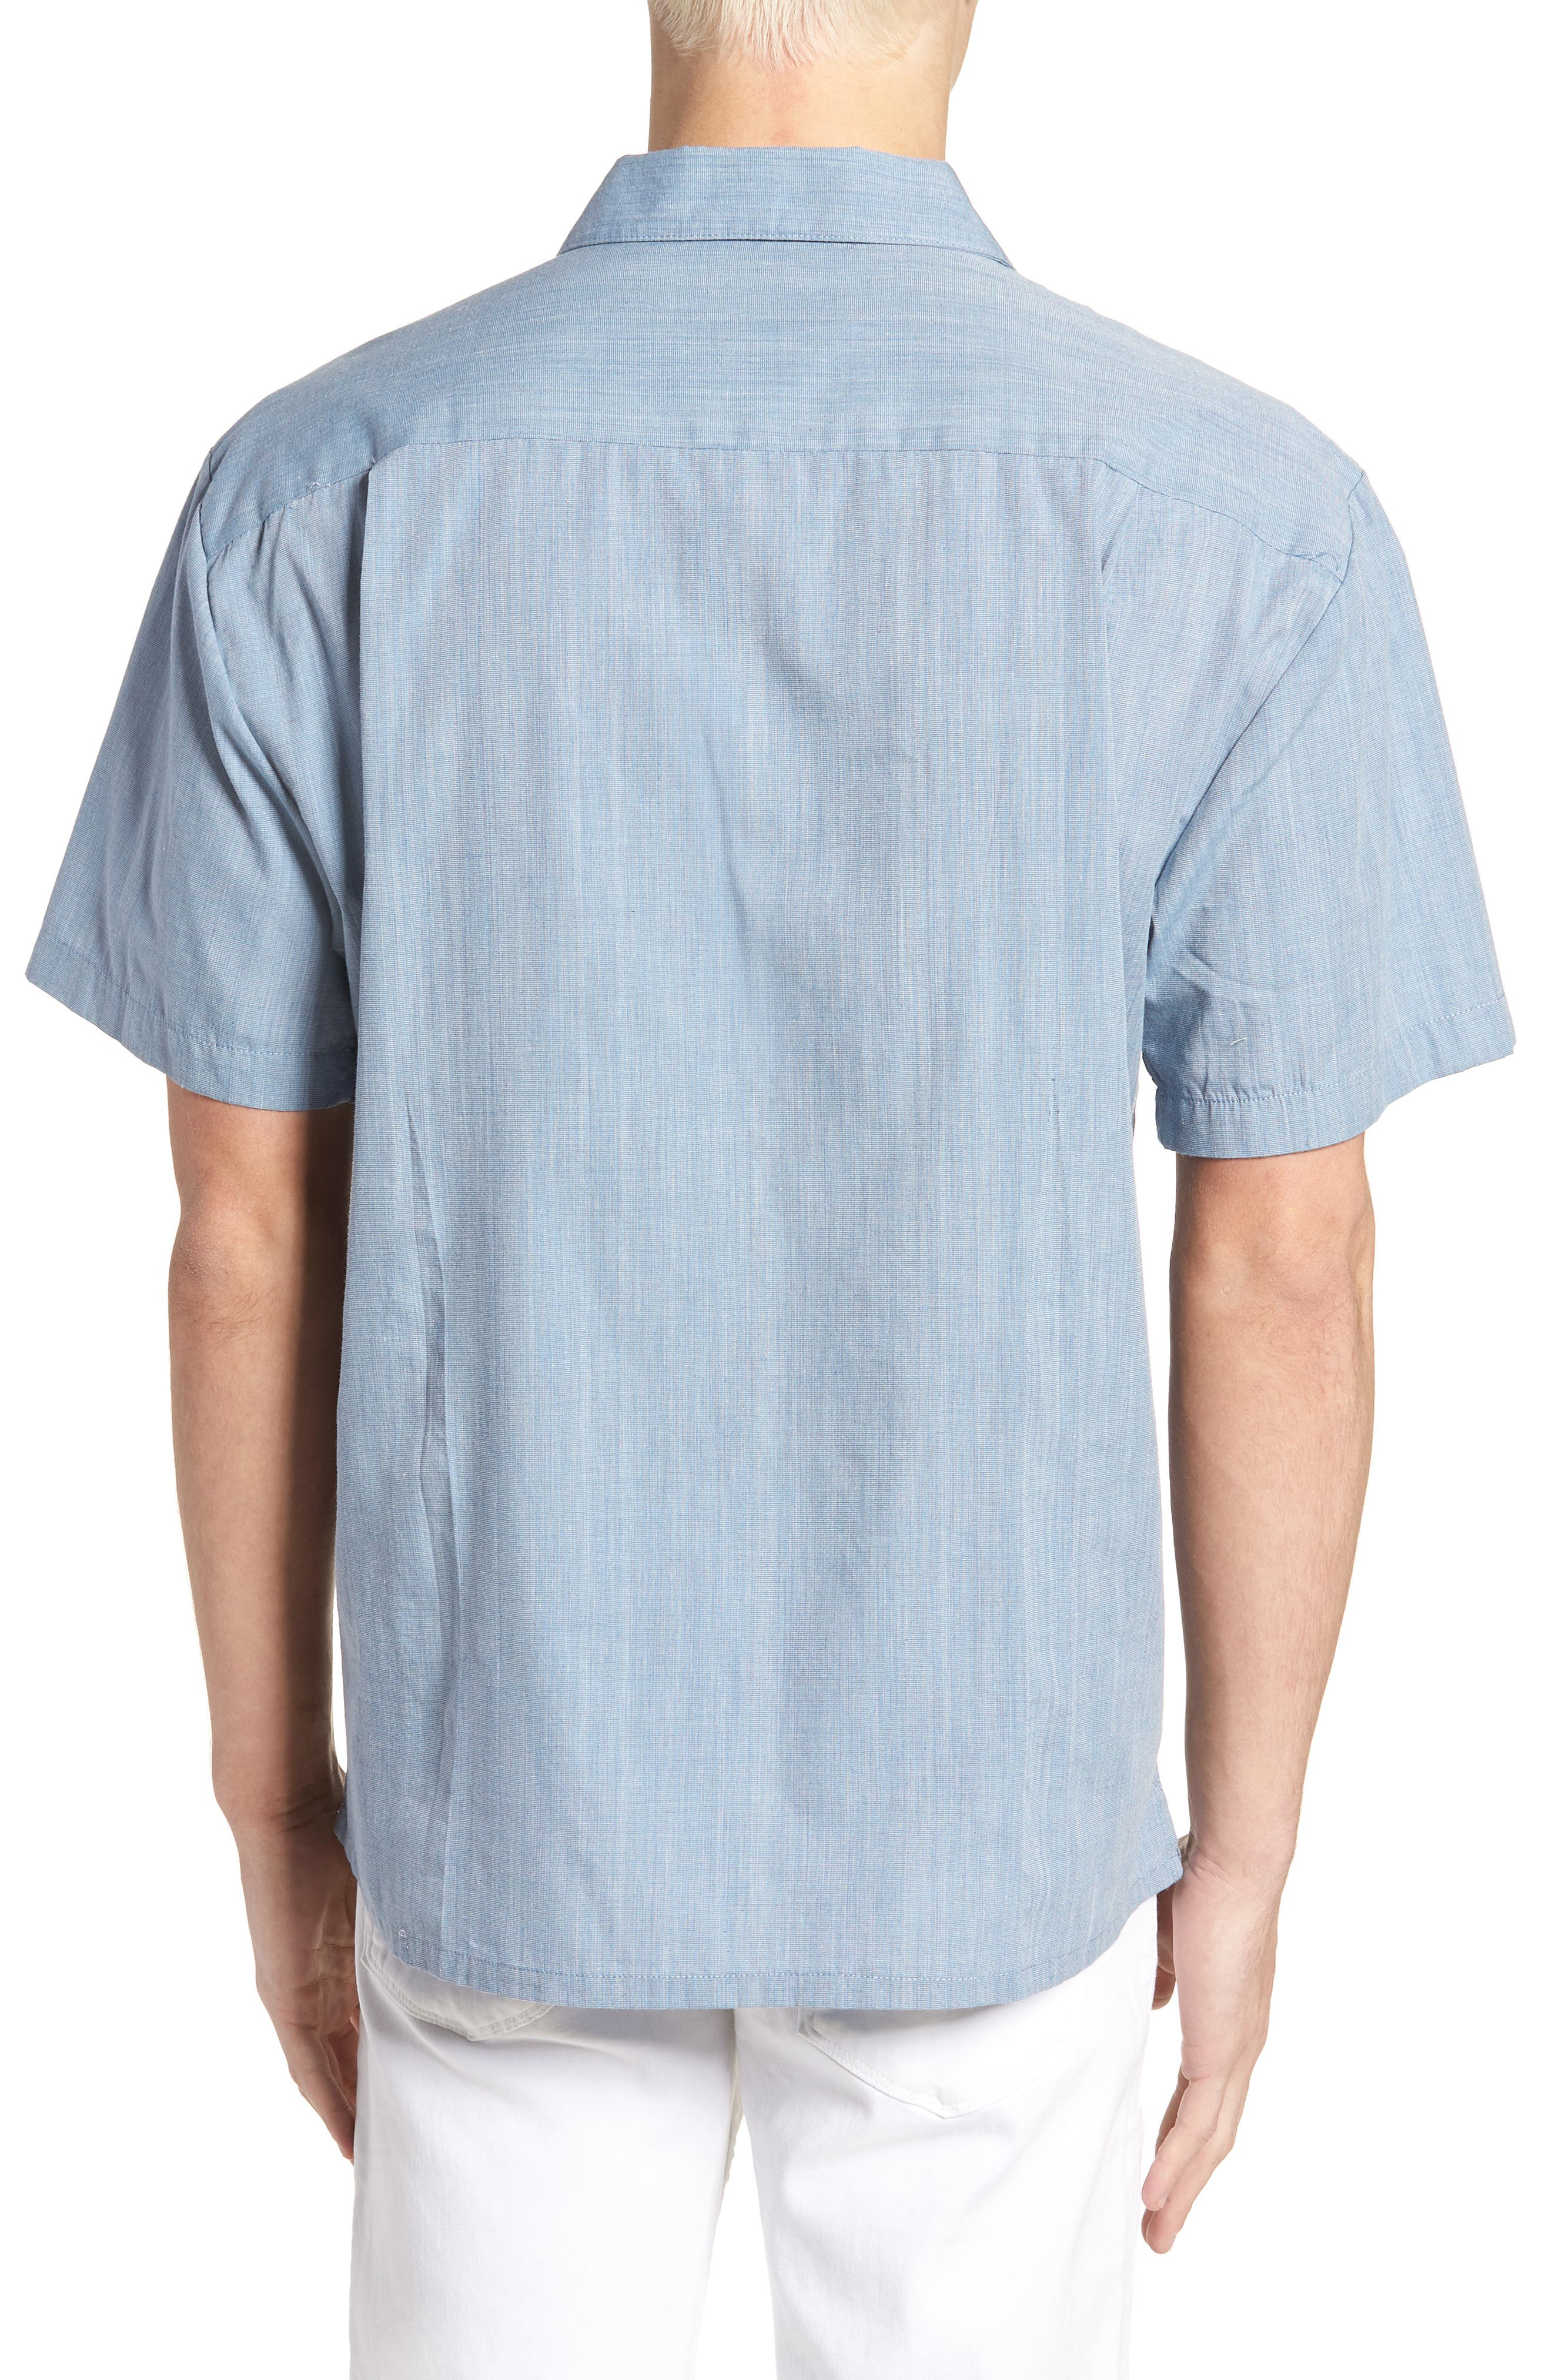 Cruze Woven Shirt,                             Alternate thumbnail 2, color,                             LIGHT BLUE